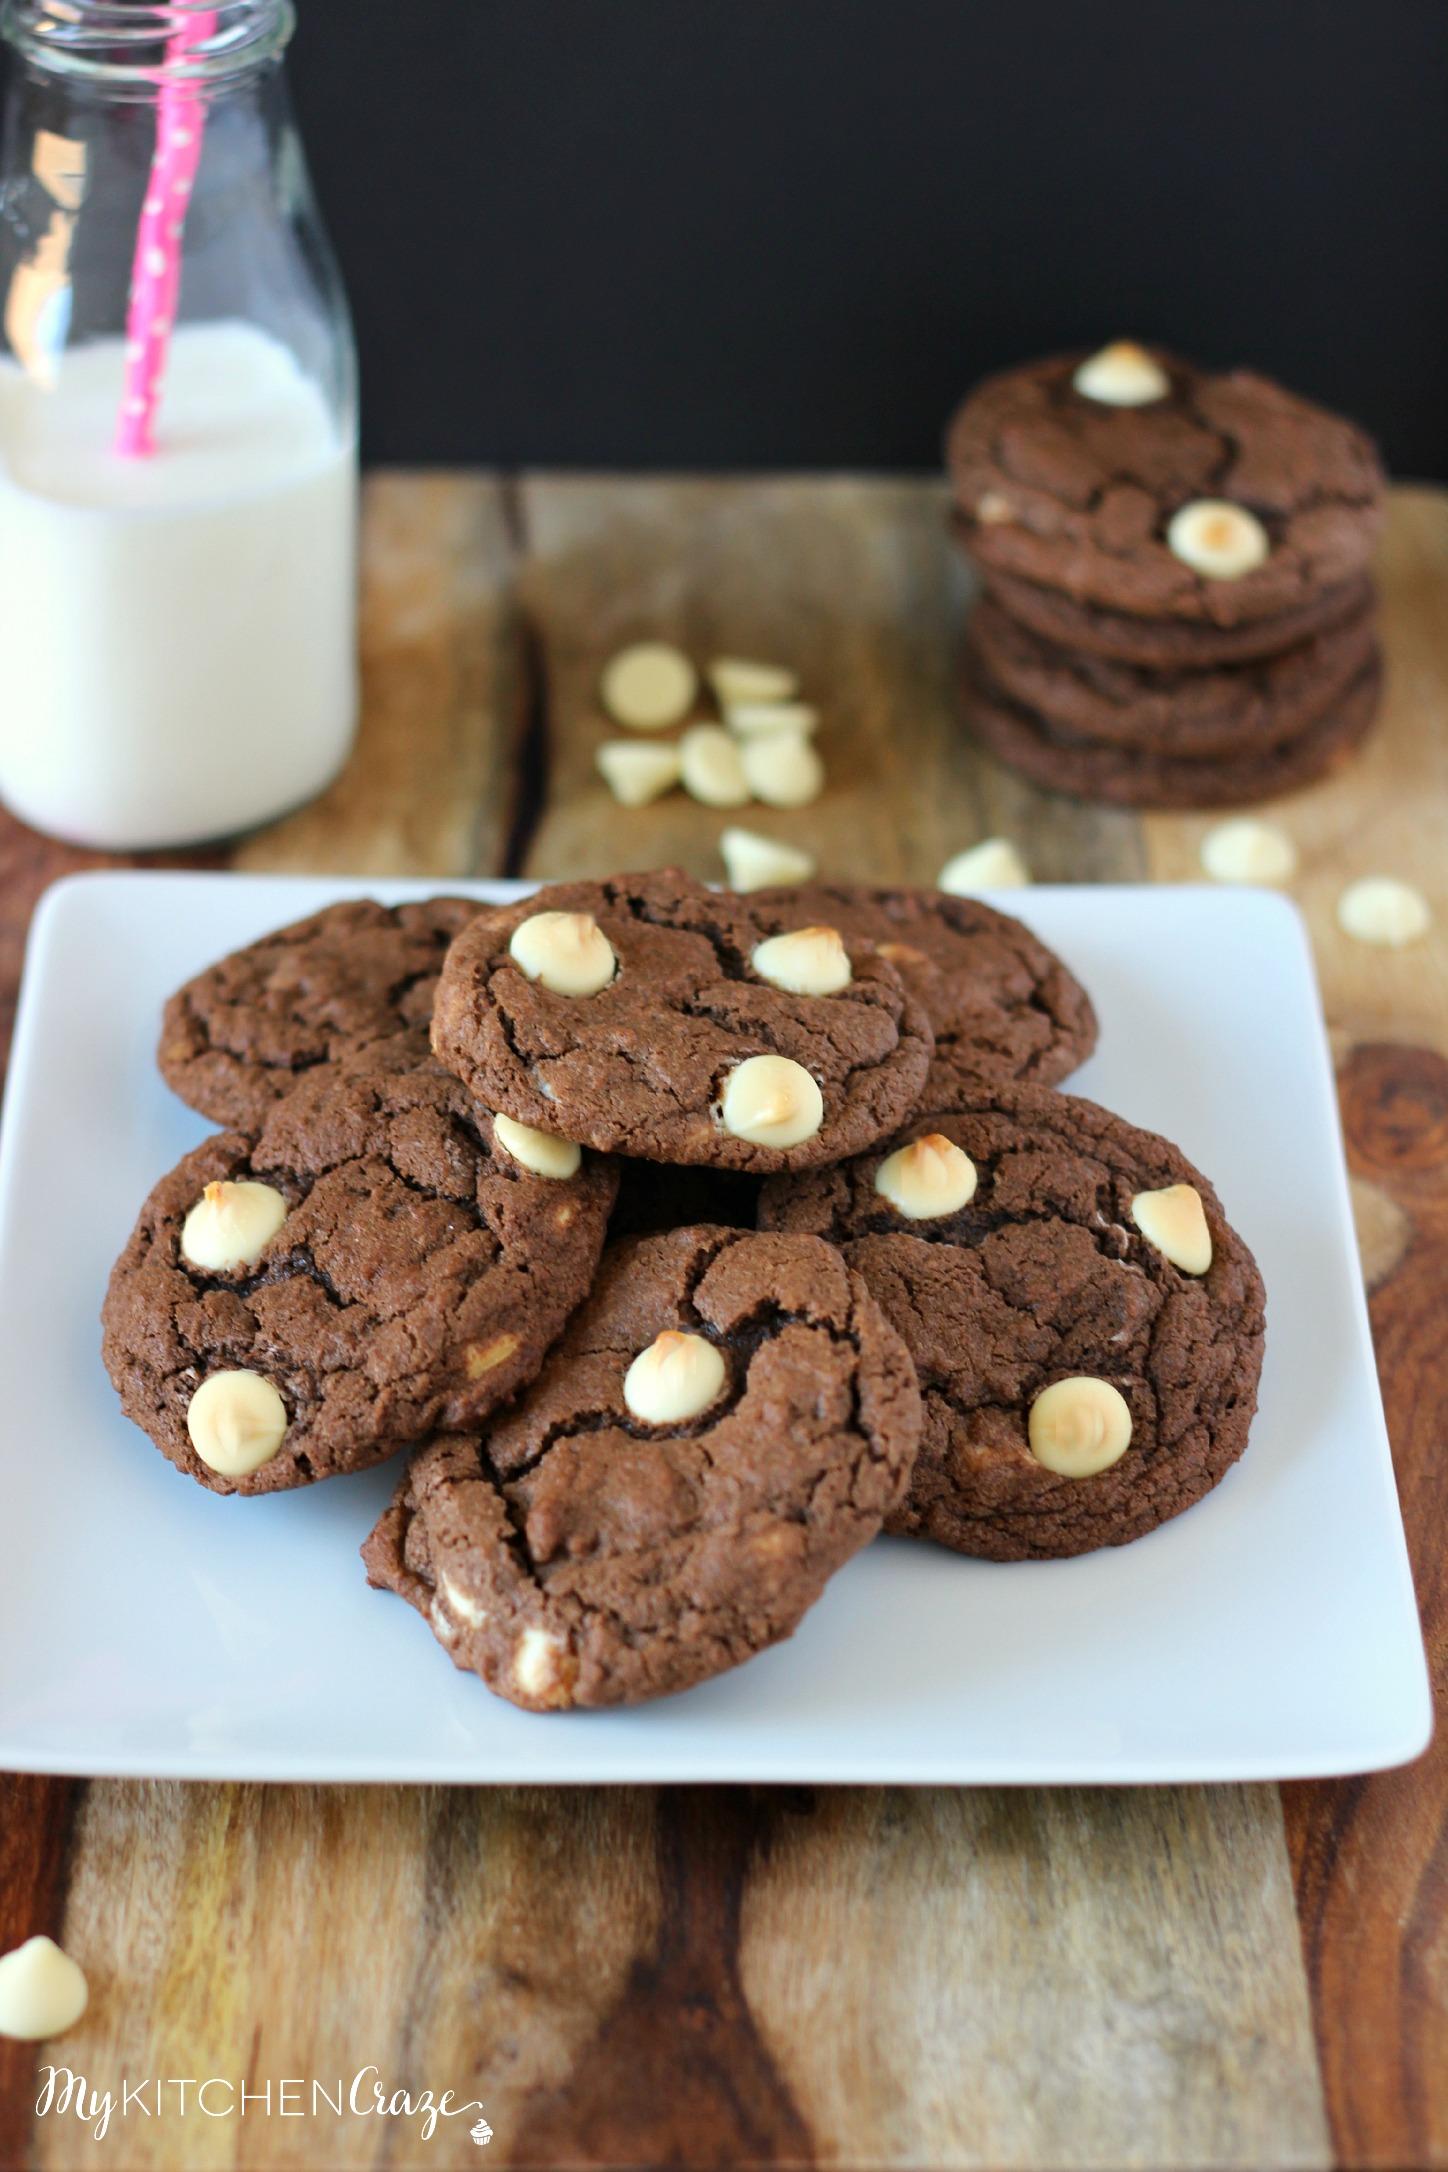 Chocolate White Chocolate Chip Cookies - My Kitchen Craze